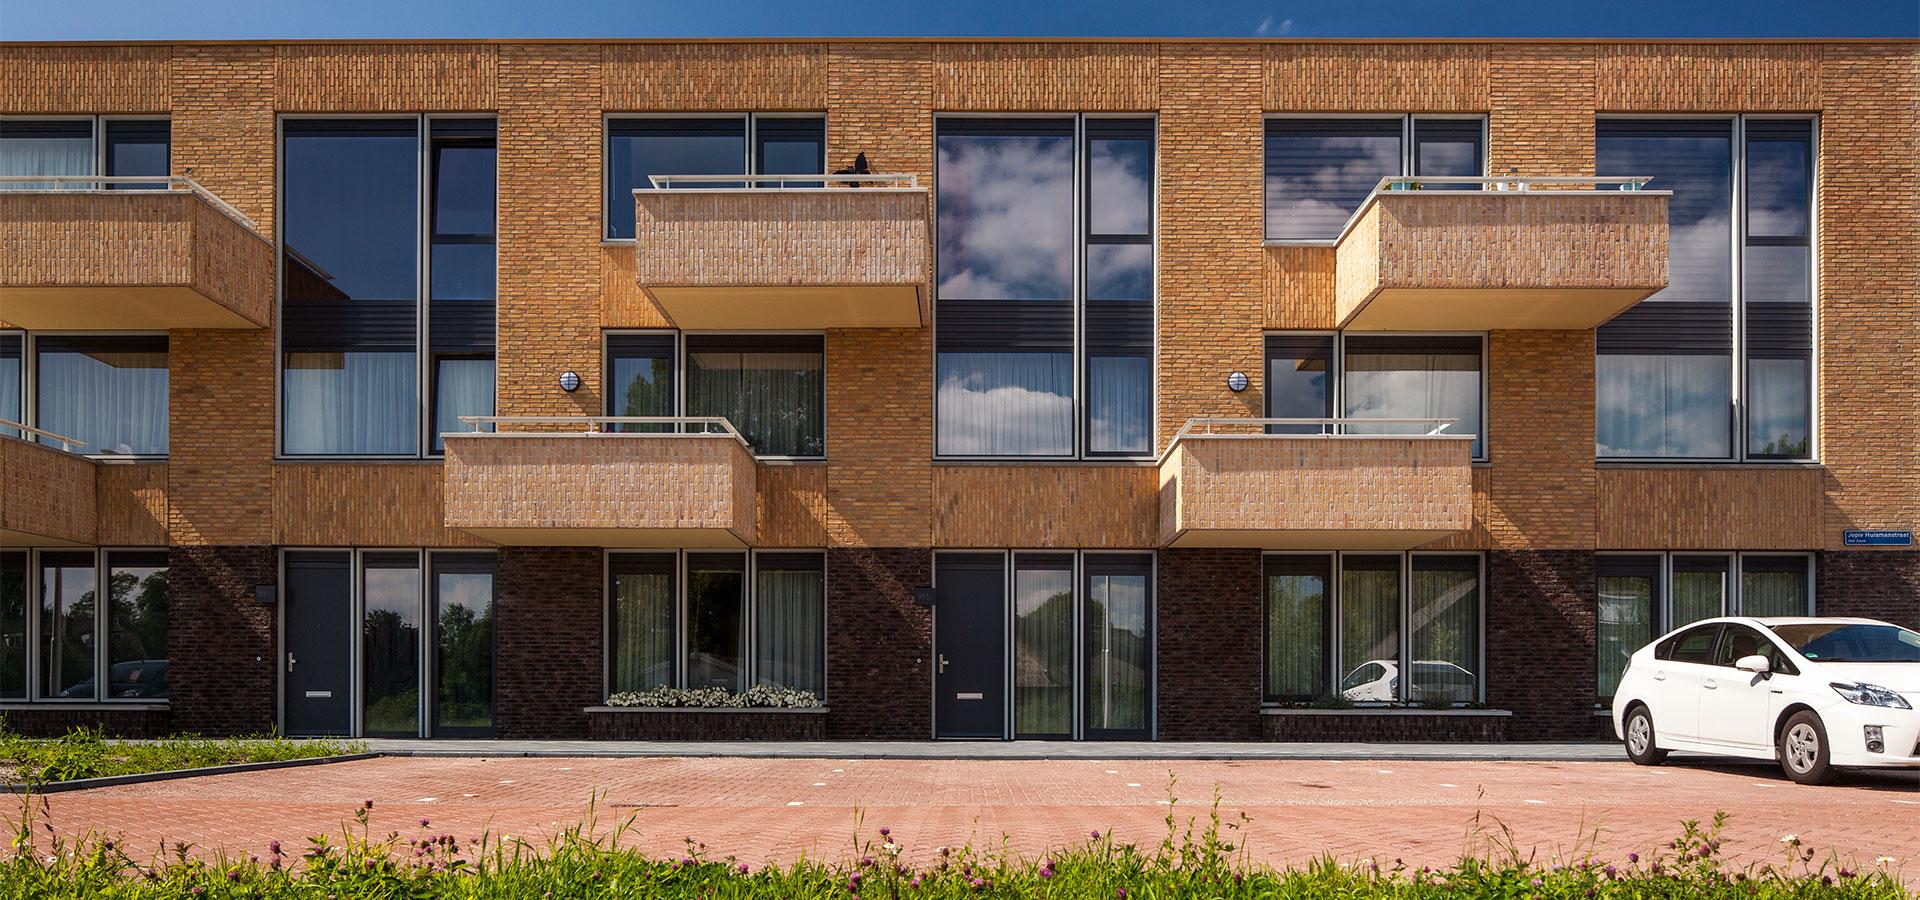 FARO architecten 't Zand Leidsche Rijn Utrecht 04